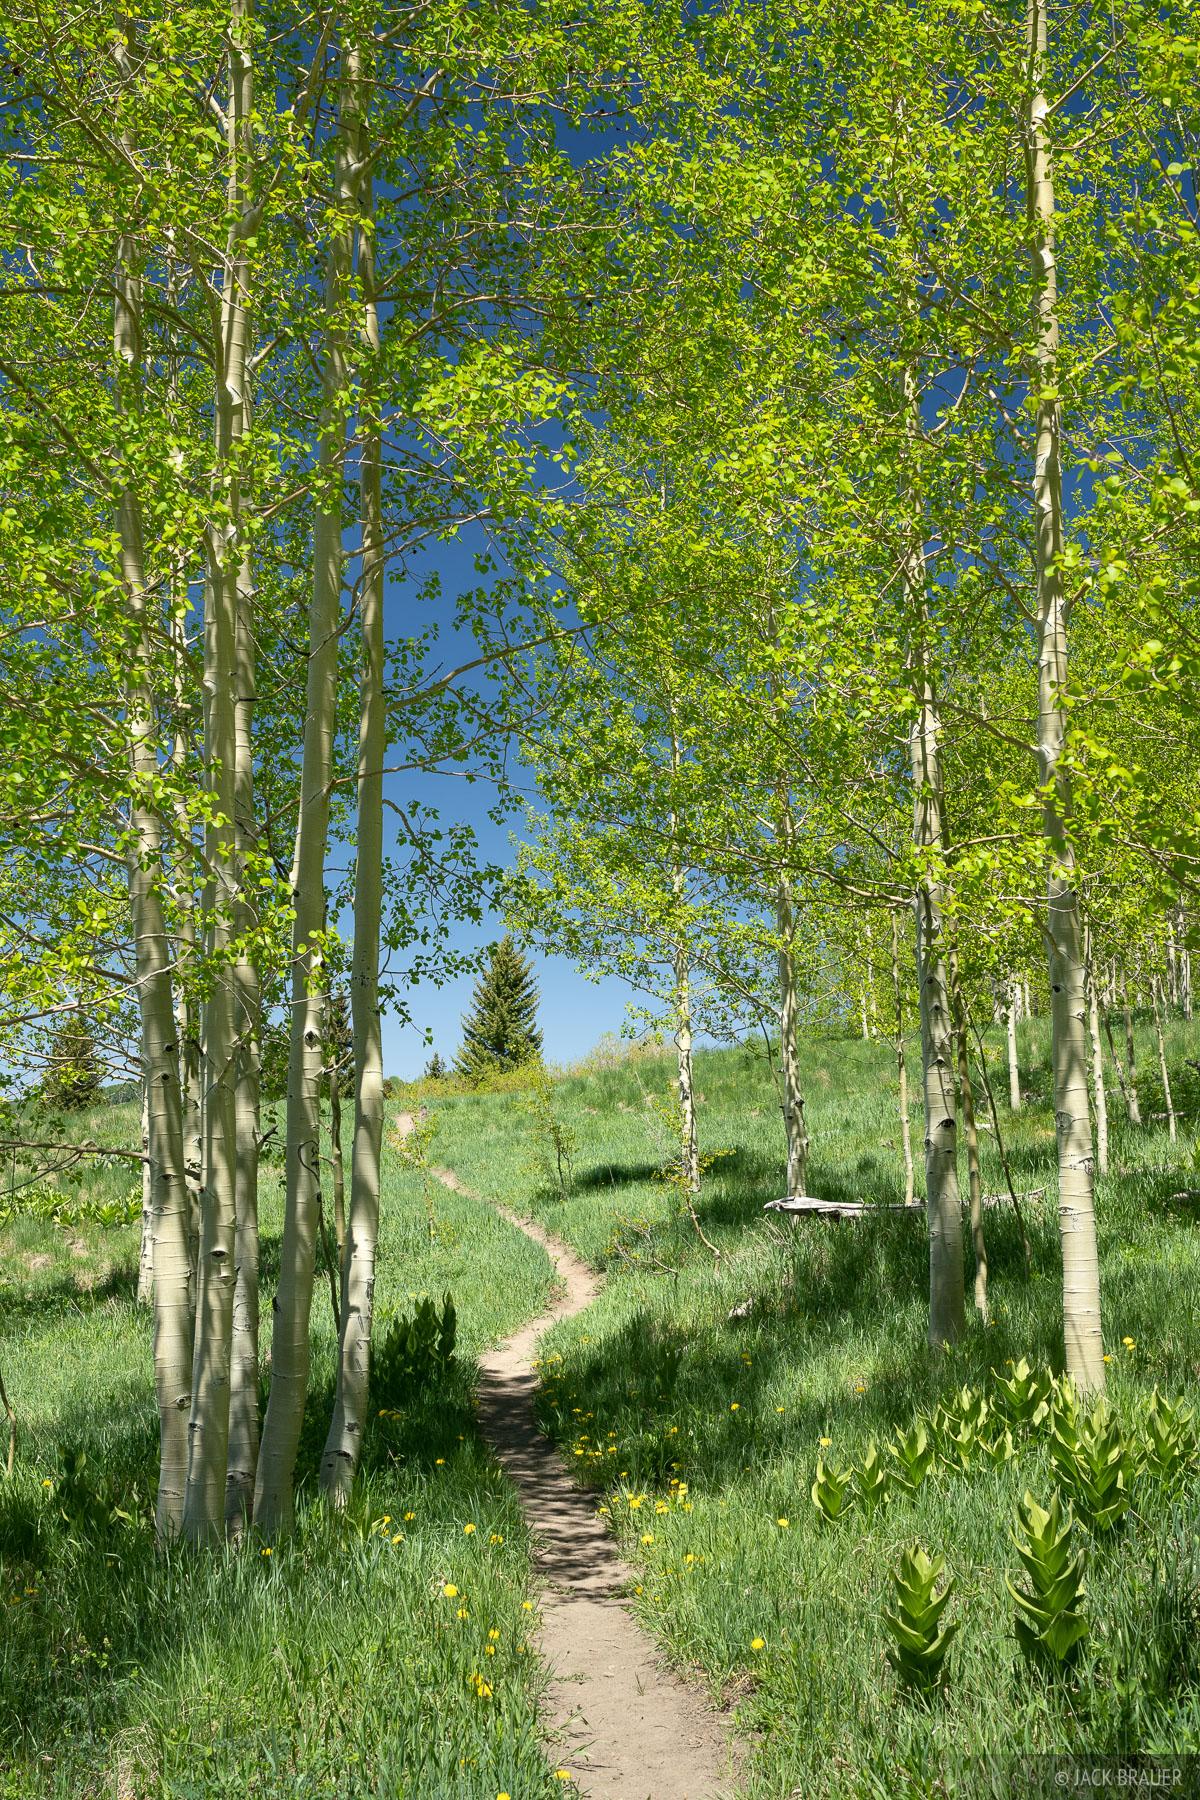 A happy little trail through happy little aspens.